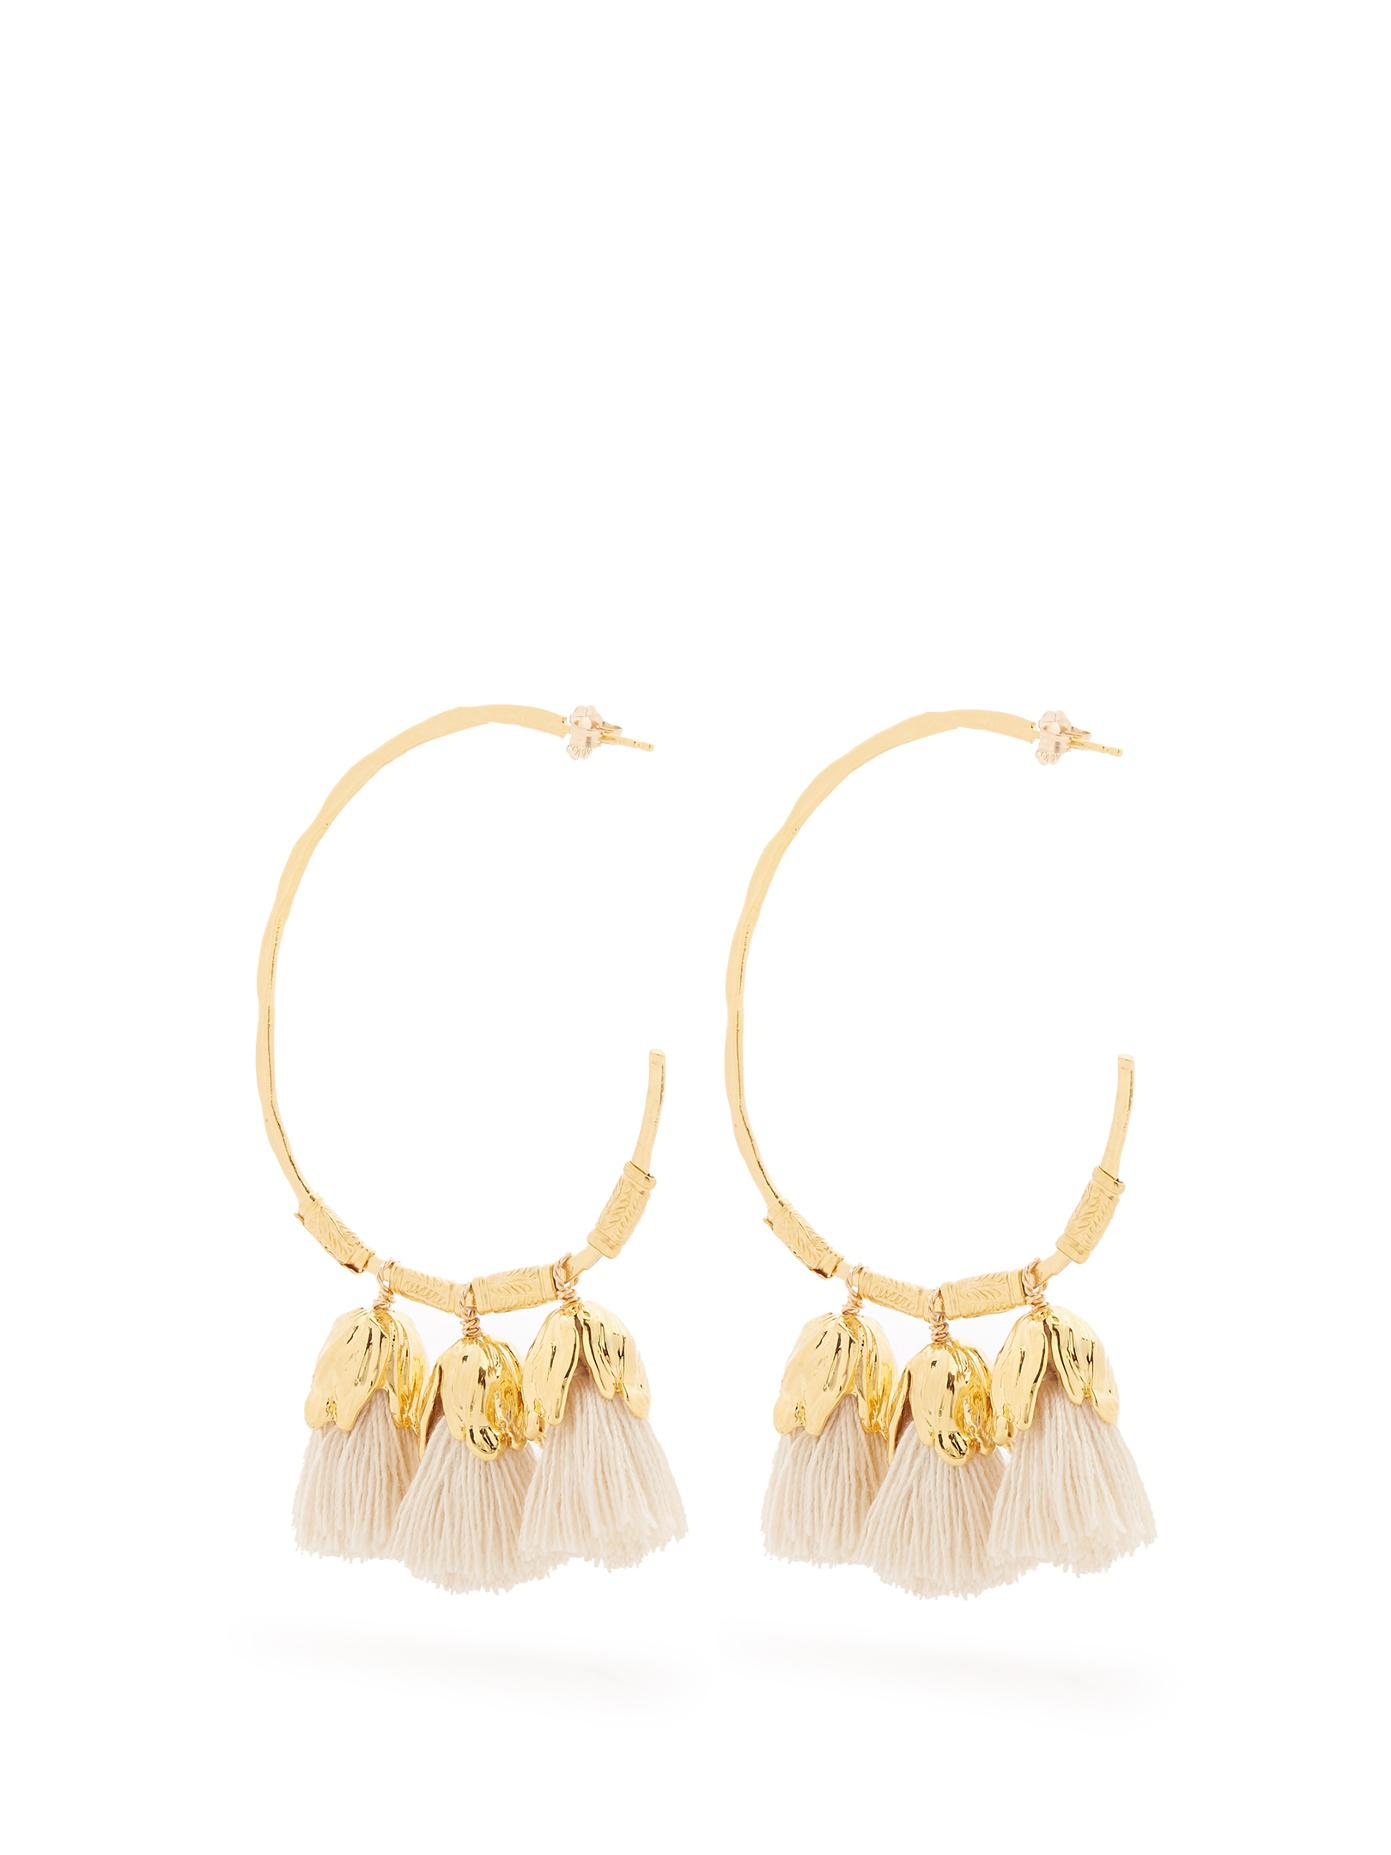 Elise Tsikis Paris Hora white tassel-drop earrings AbZrQ6NxK0